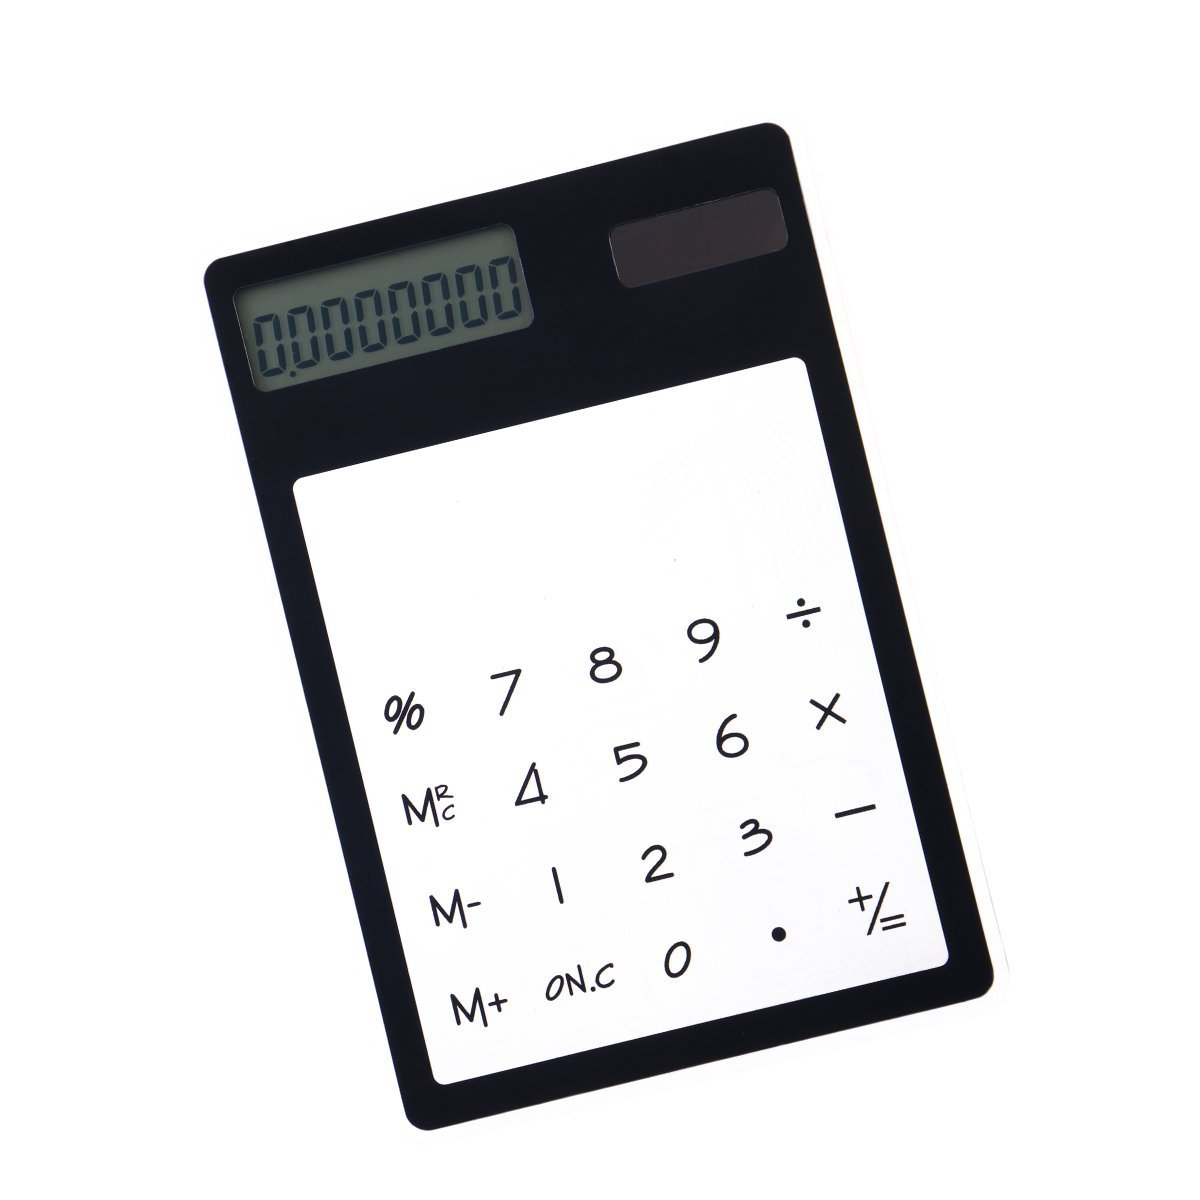 Frcolor Solar Powered Calculator Unique Transparent Touch Panel Design Small Calculator (Black)